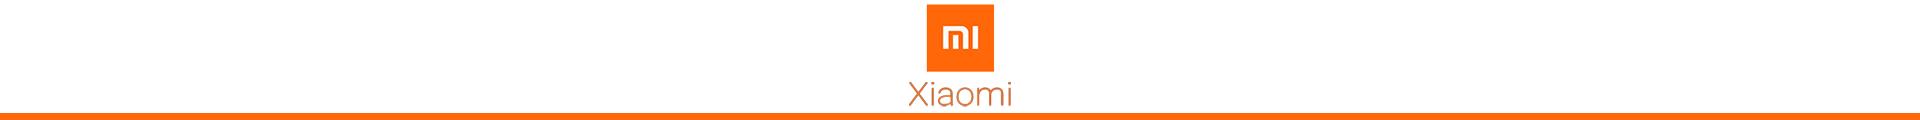 xiaomi-label-small-line-2 Phụ Kiện Pico  Khuyến mại 12-12-2020